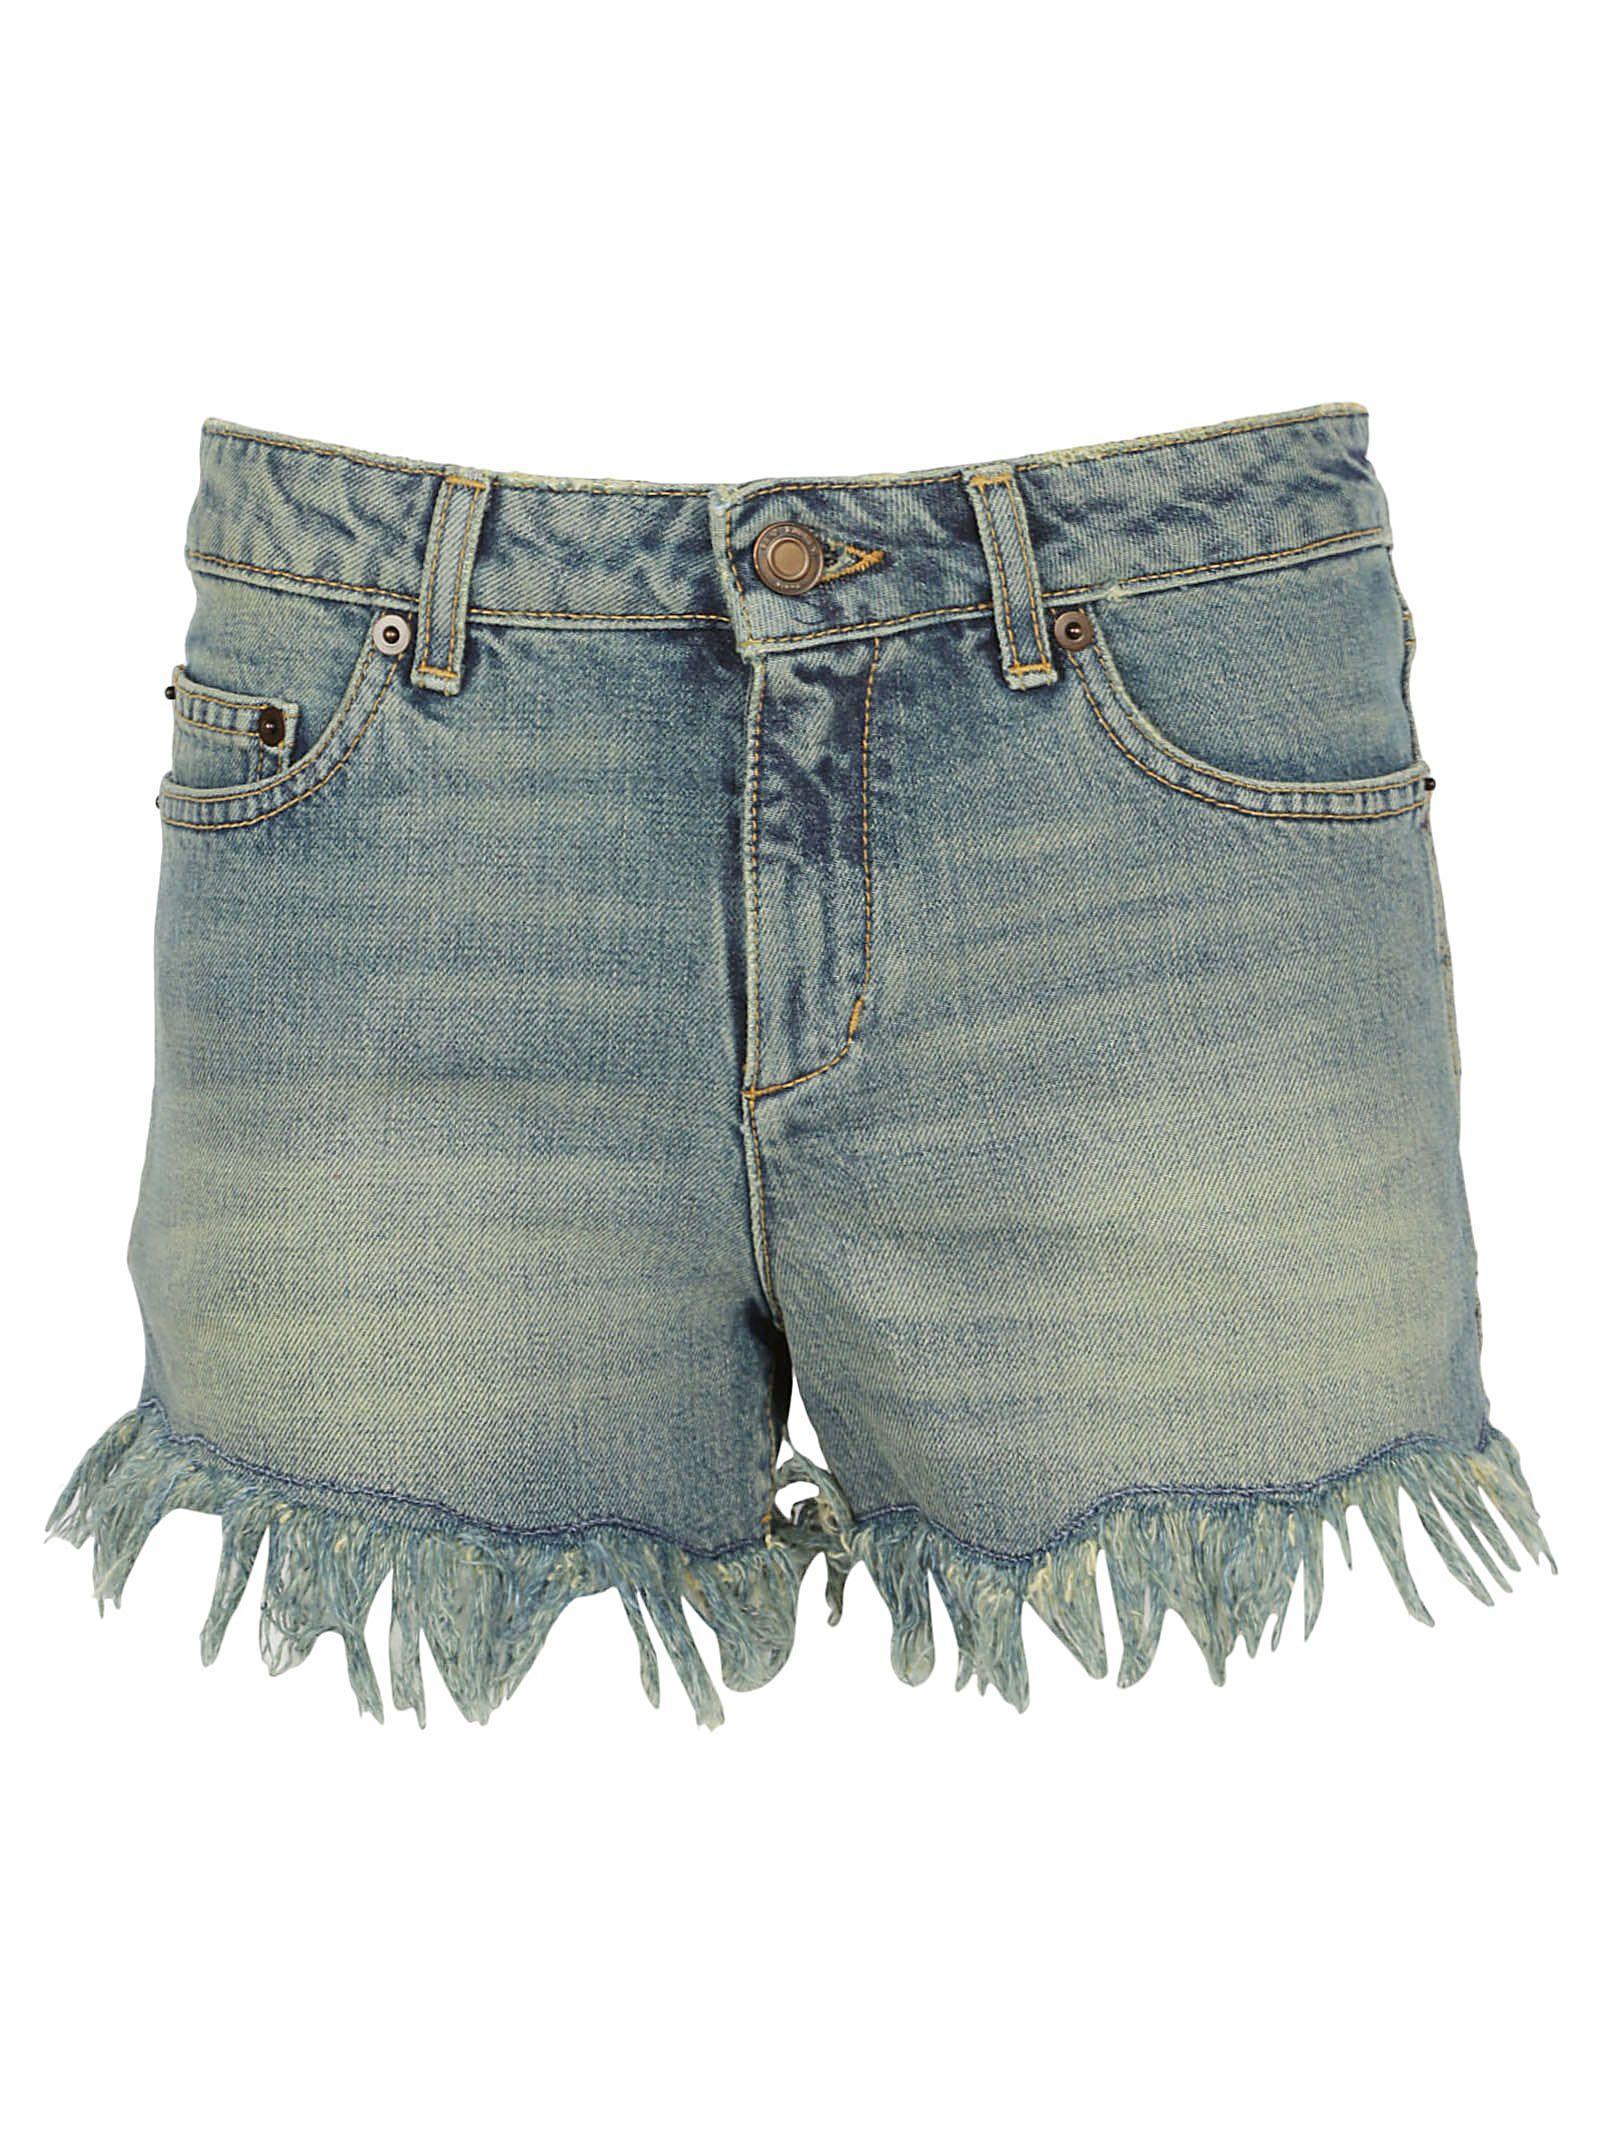 Saint Laurent Shorts In Rusty Blue